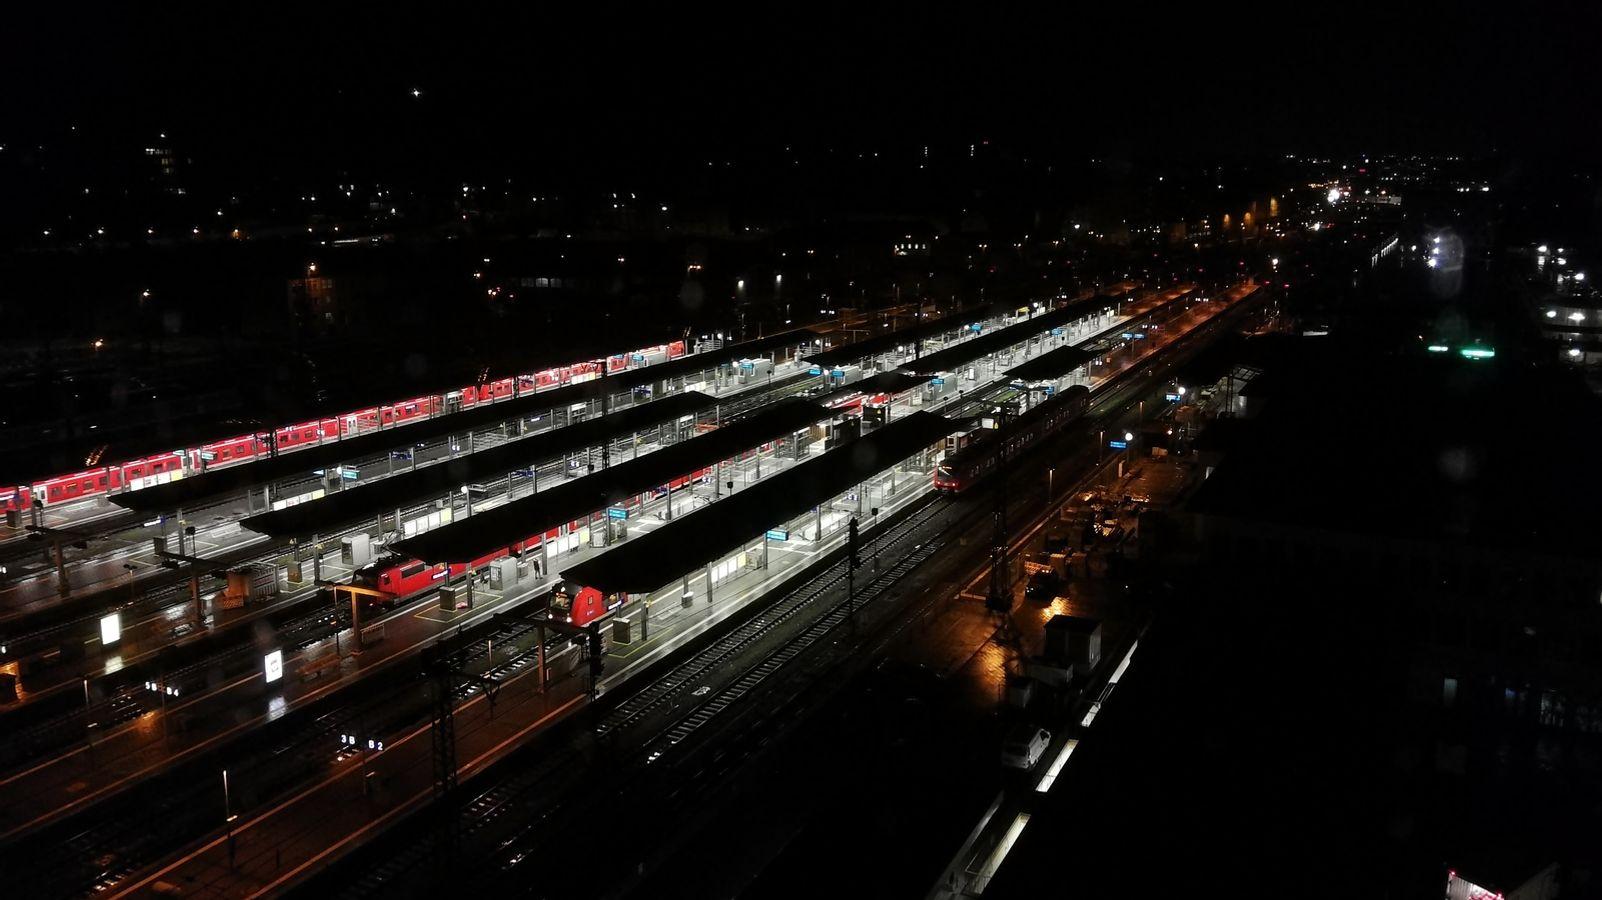 Unfall mit Güterzug in Würzburg: Bahnverbindungen entfallen